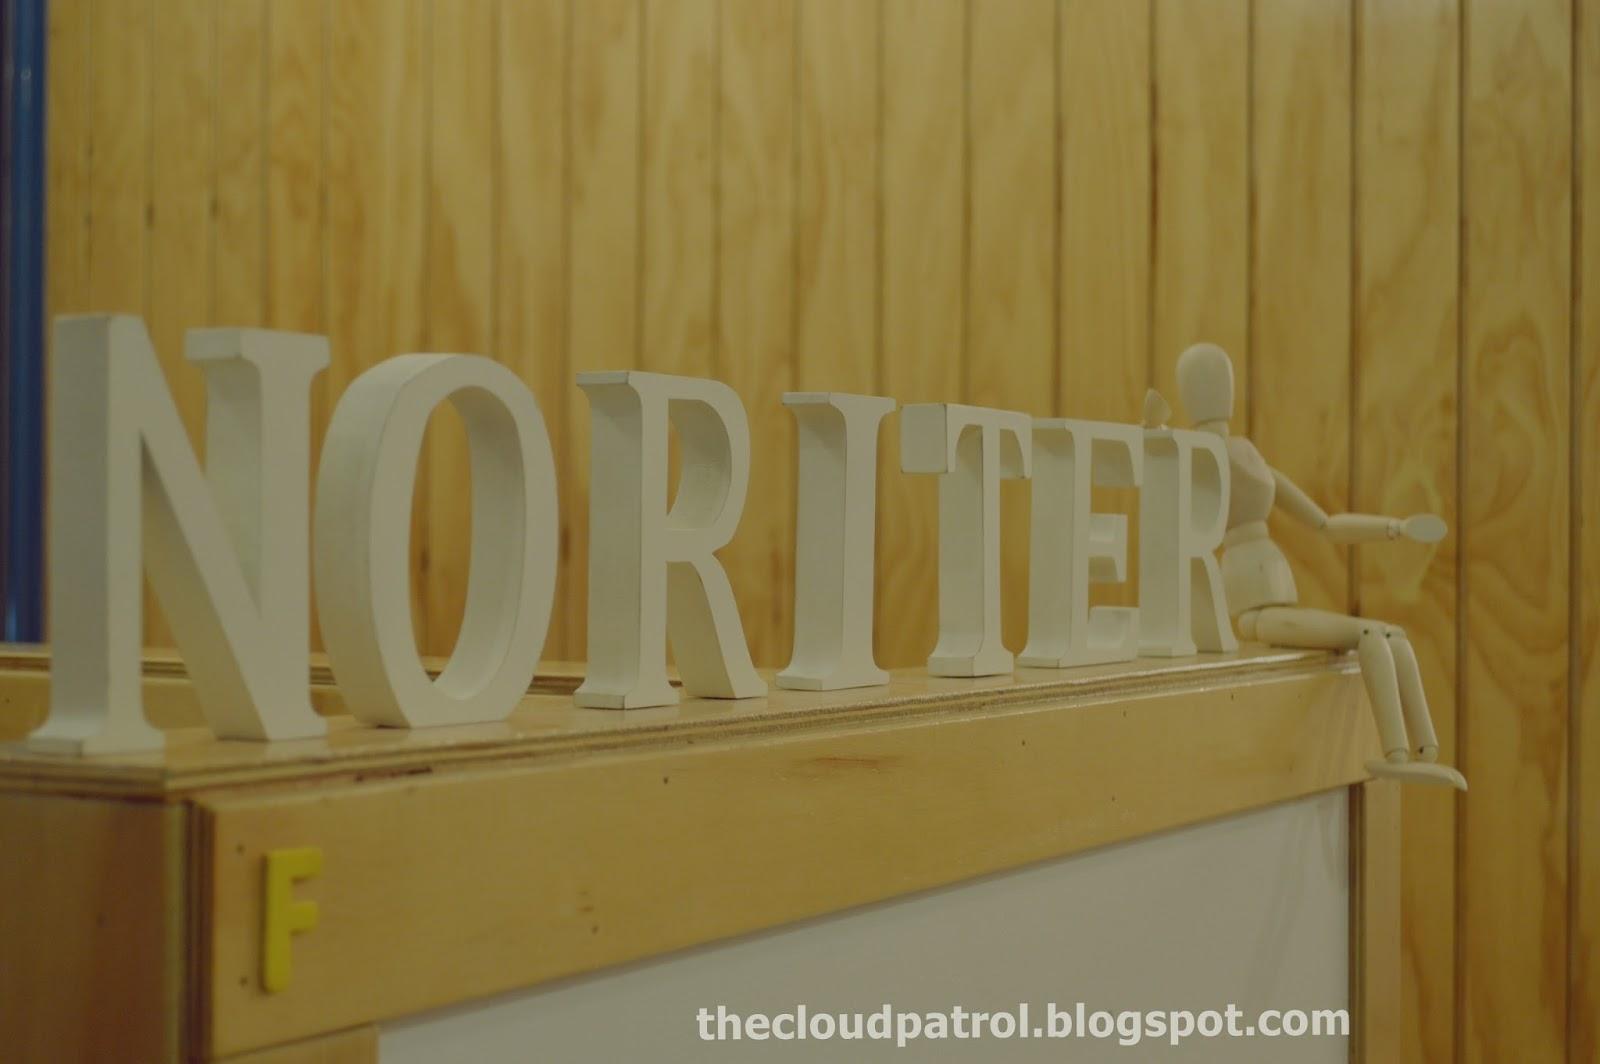 Korean Cafe, Cafe Noriter Cebu, Noriter, Cute, Quirky, Cebu City